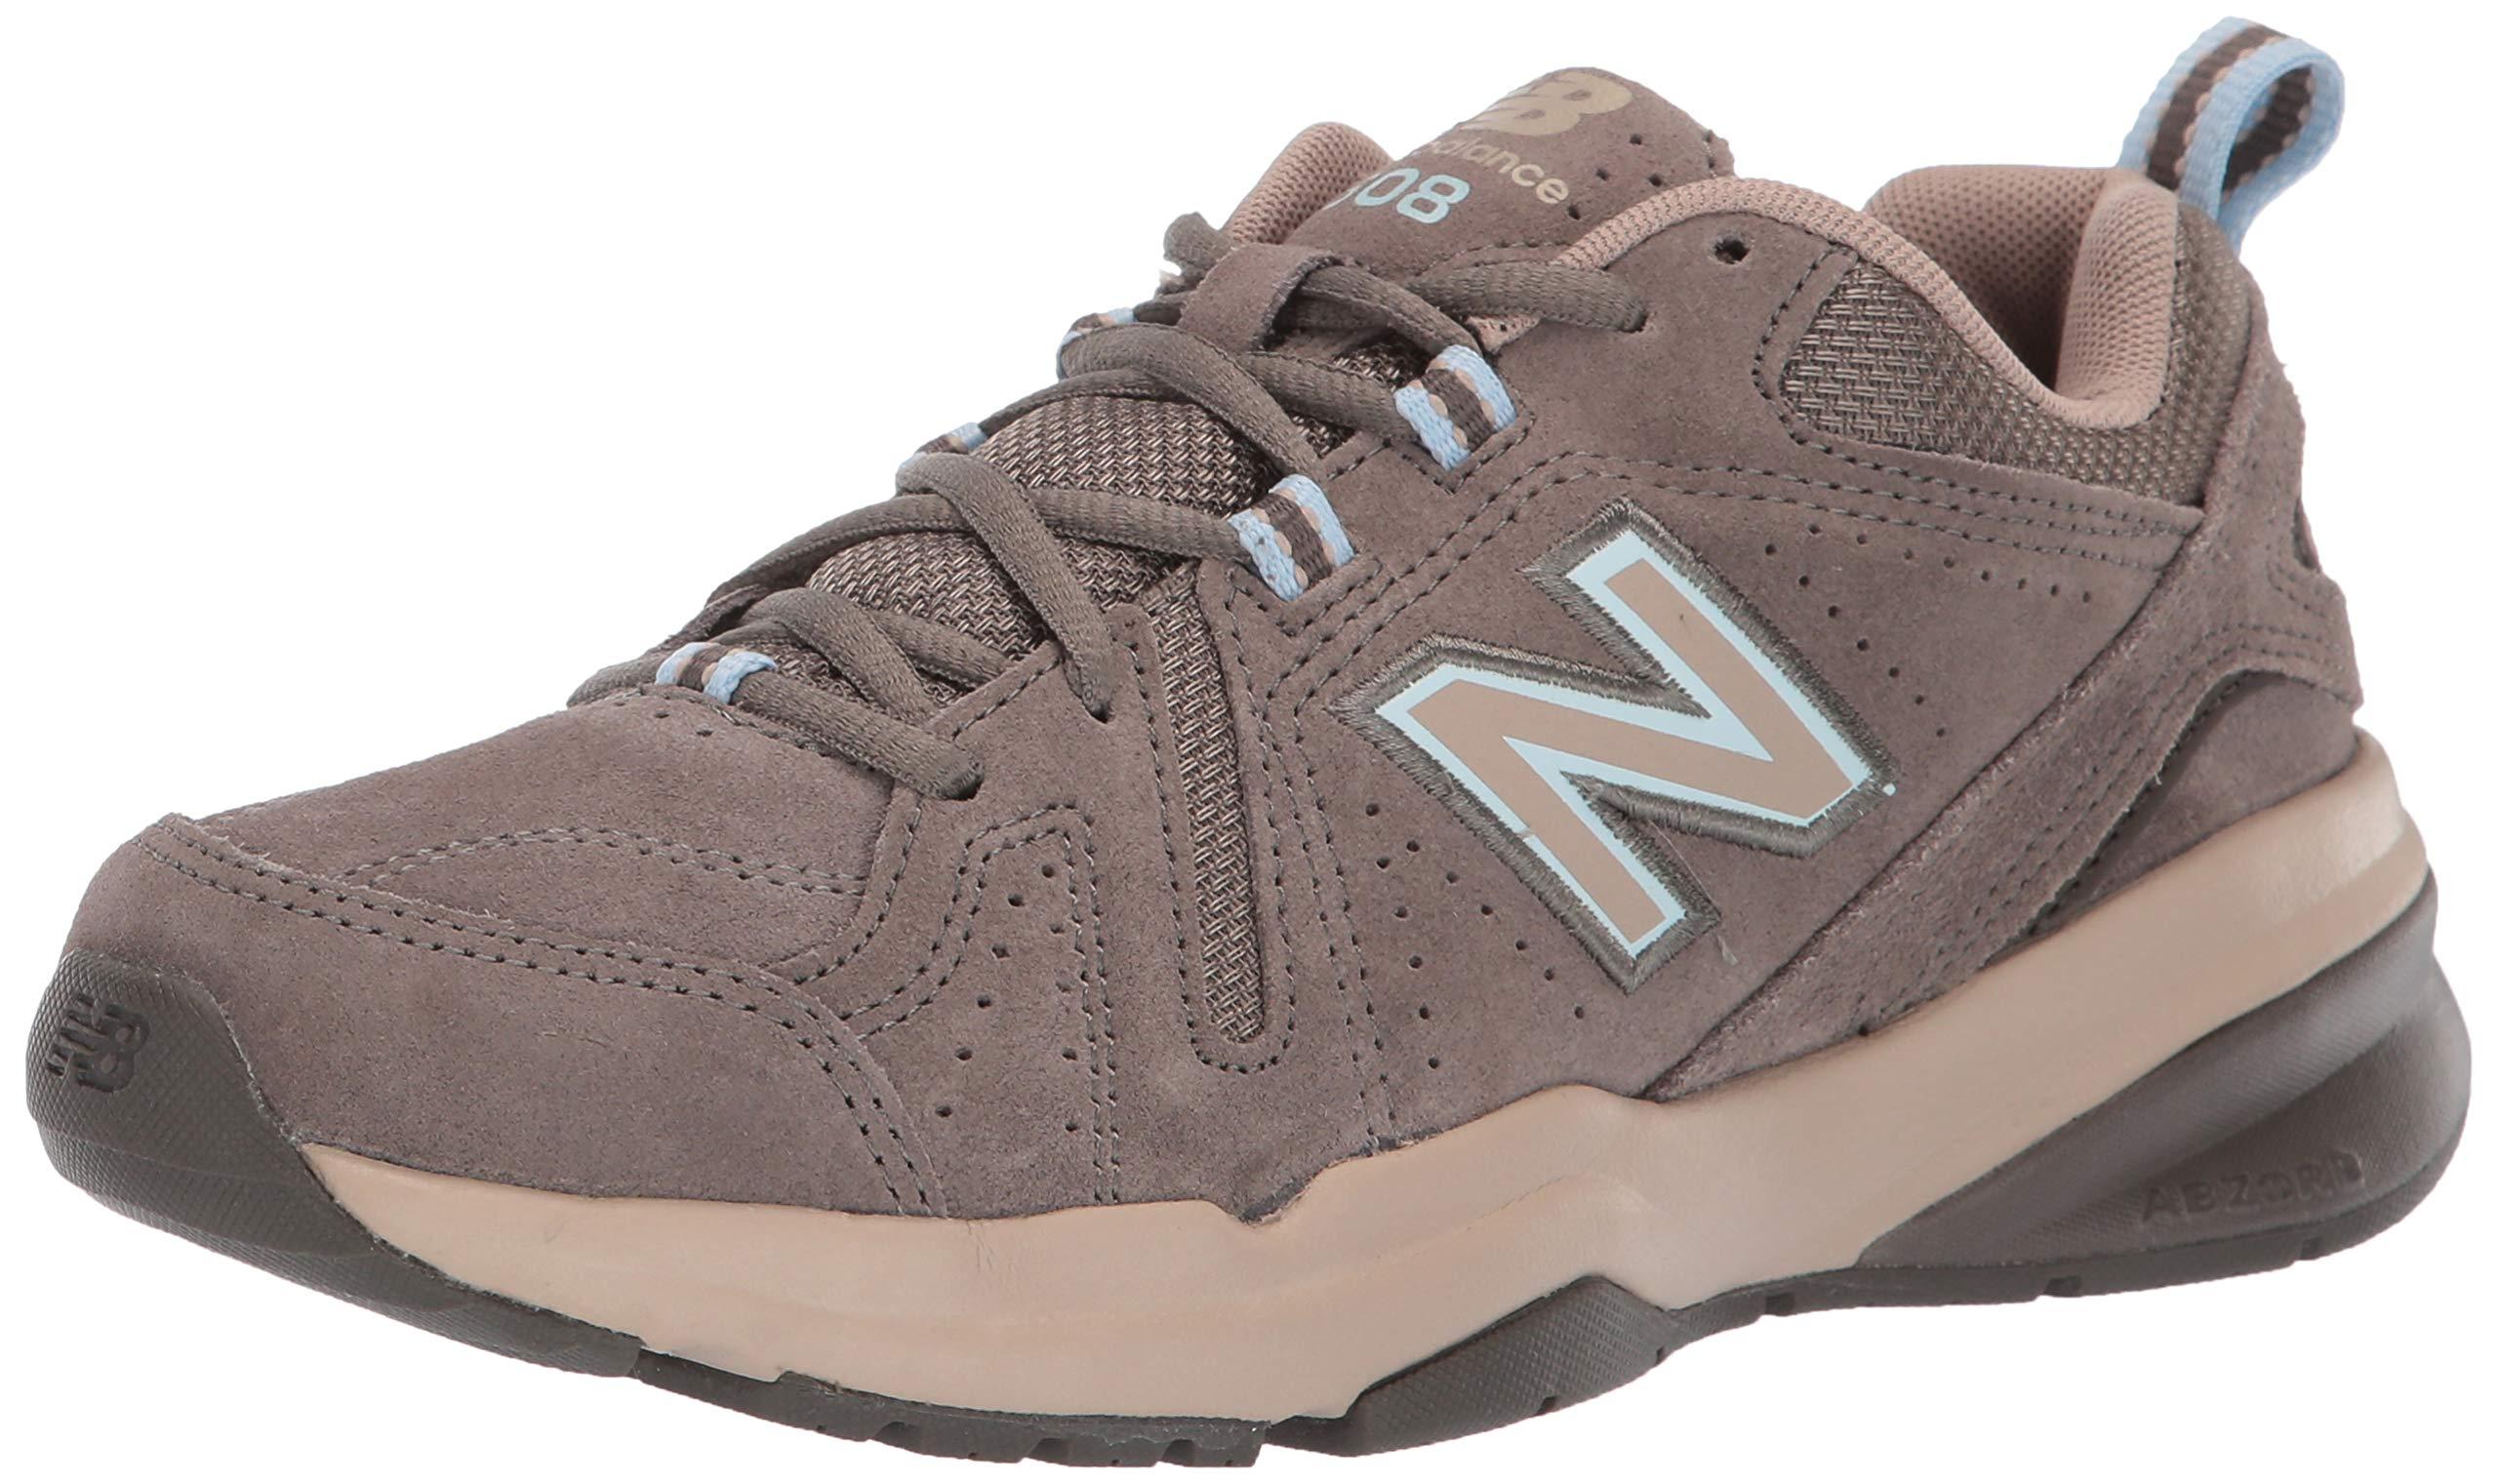 New Balance Women's 608v5 Casual Comfort Walking Shoe, Bungee/Burlap/Wren, 5 B US